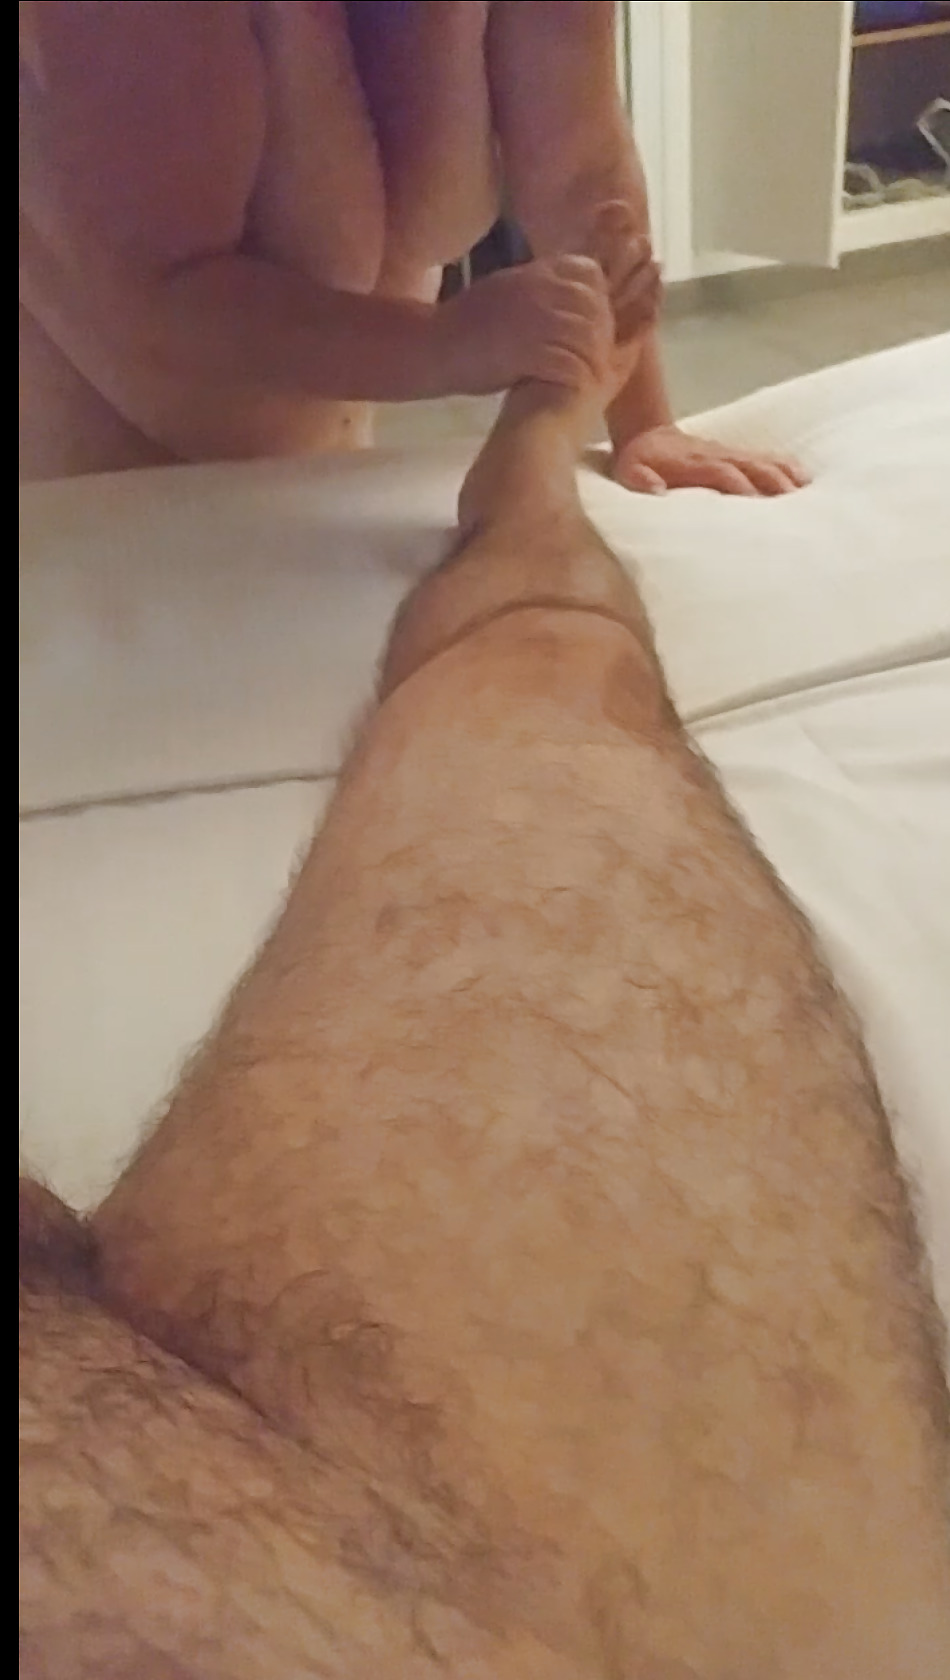 Tetuda preciosa da masaje a chico y se lo folla - 2 part 3